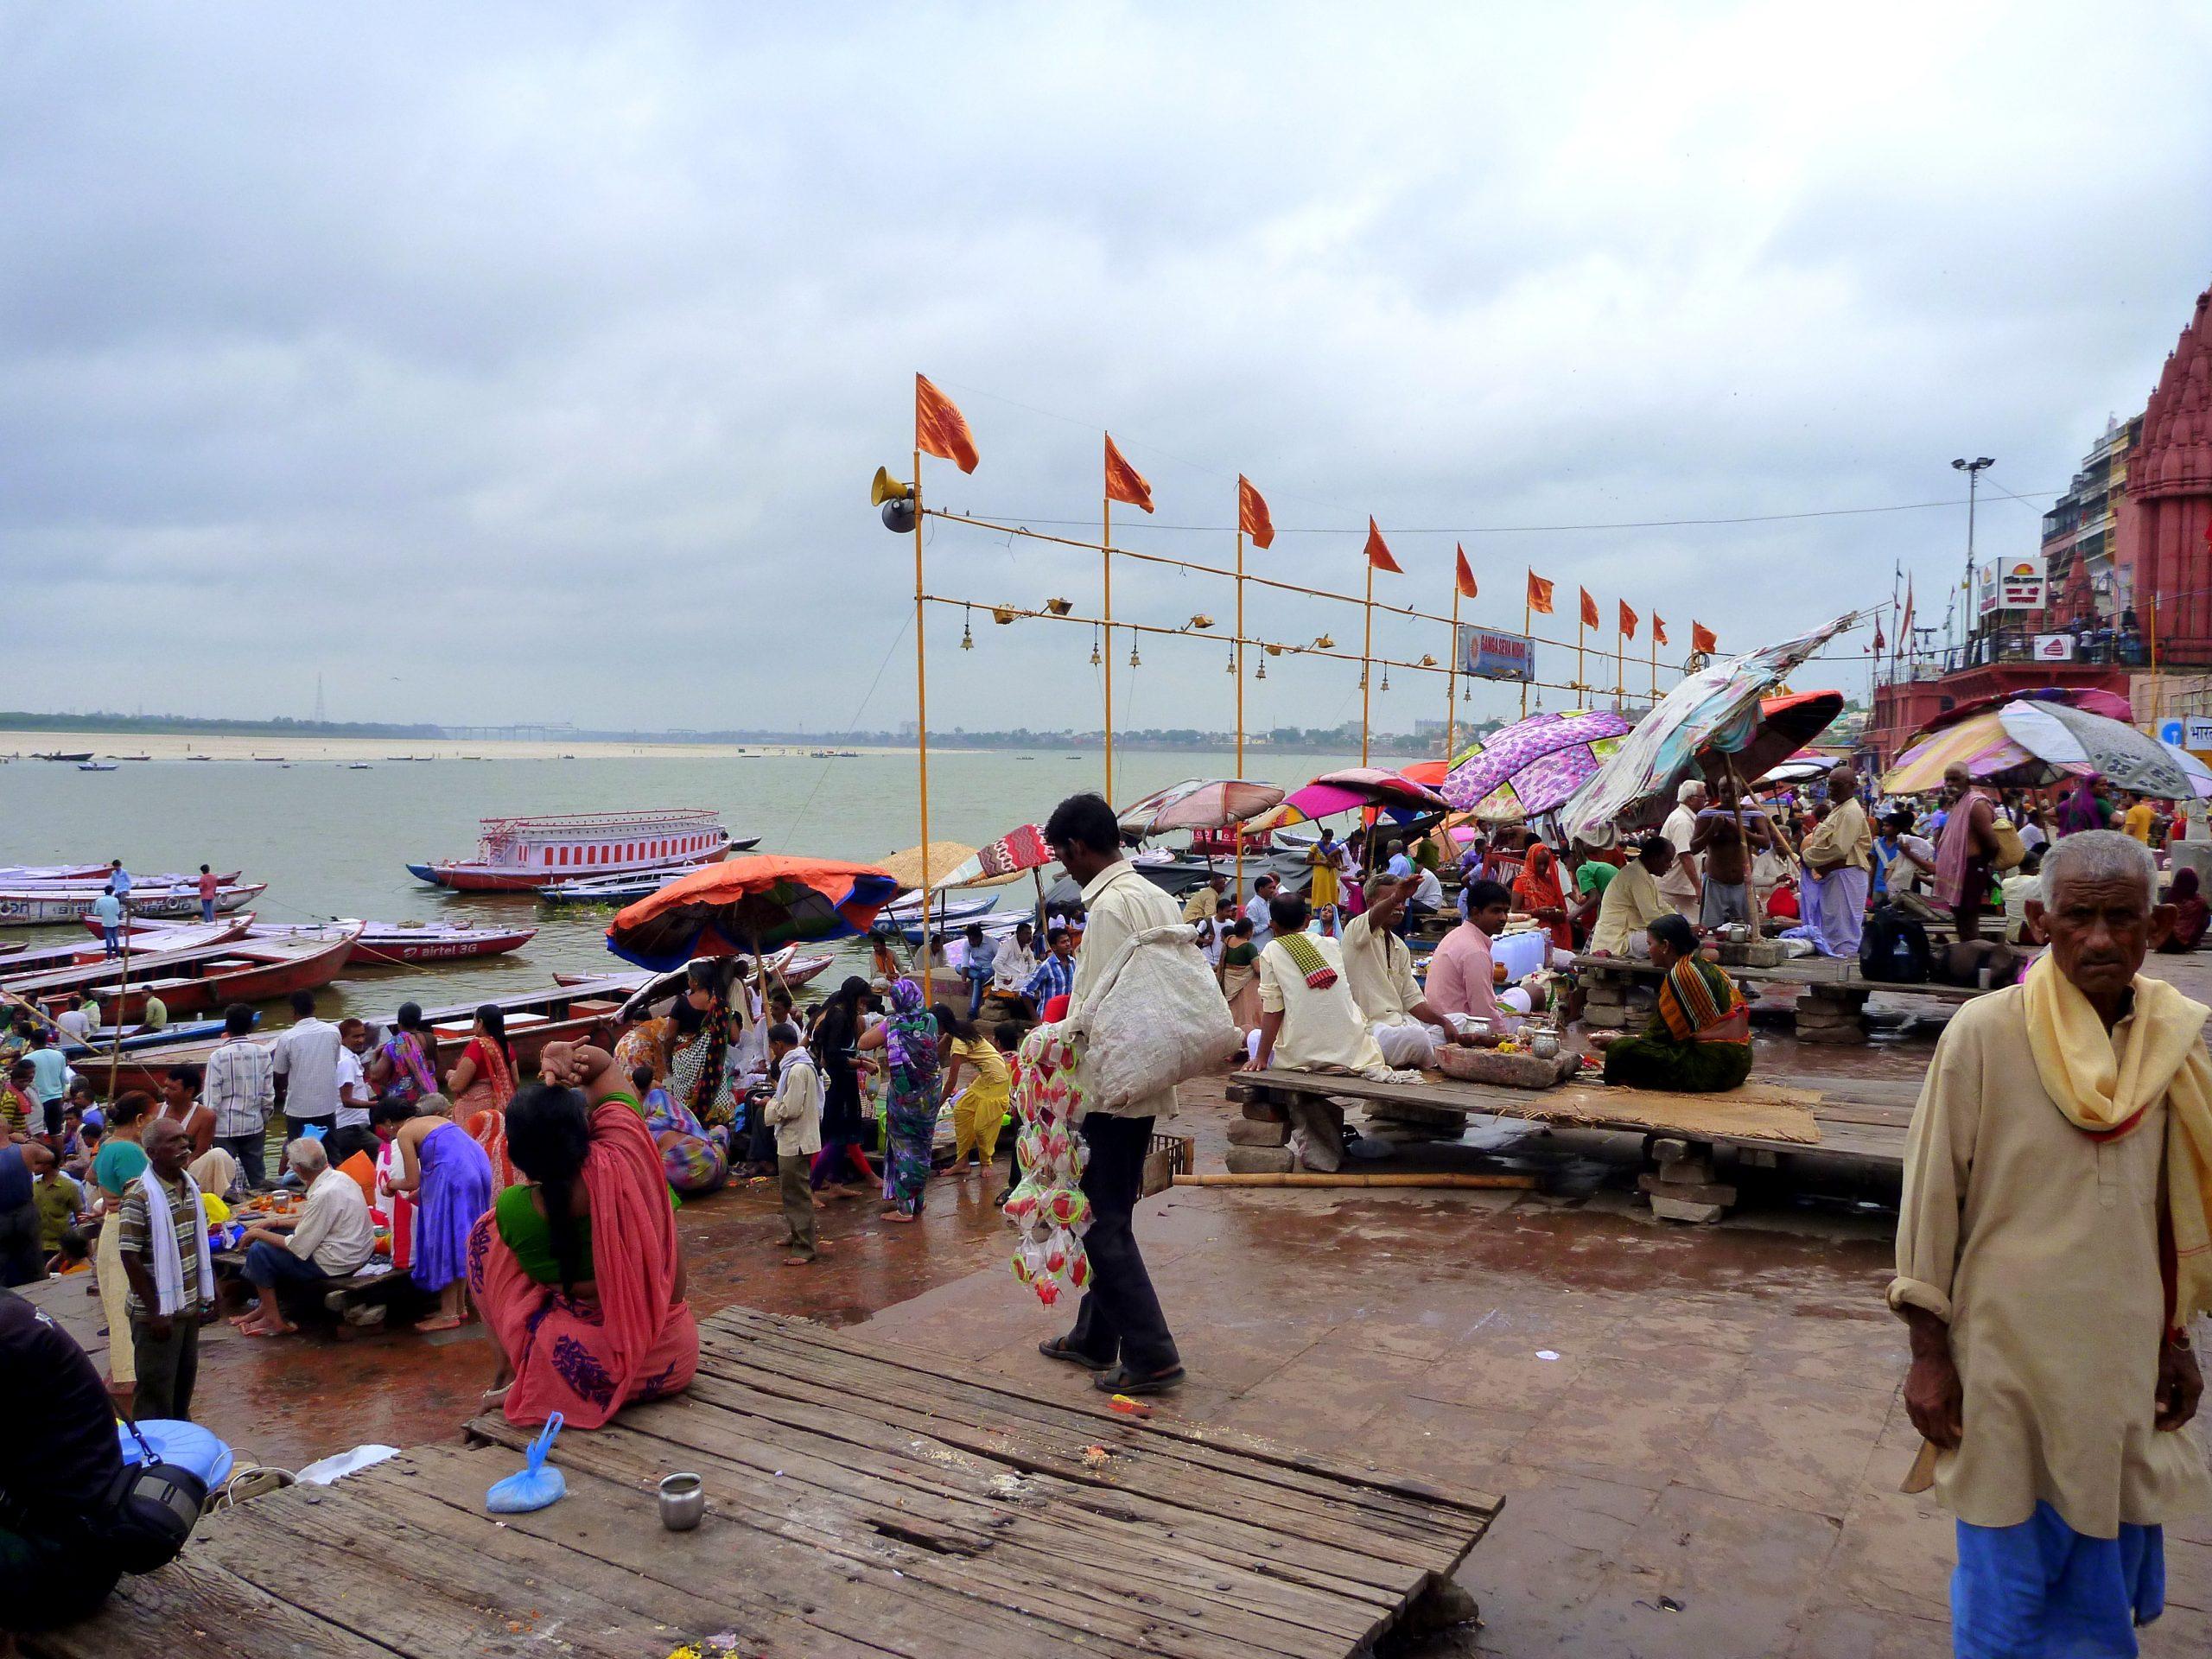 2015, Varanasi, India